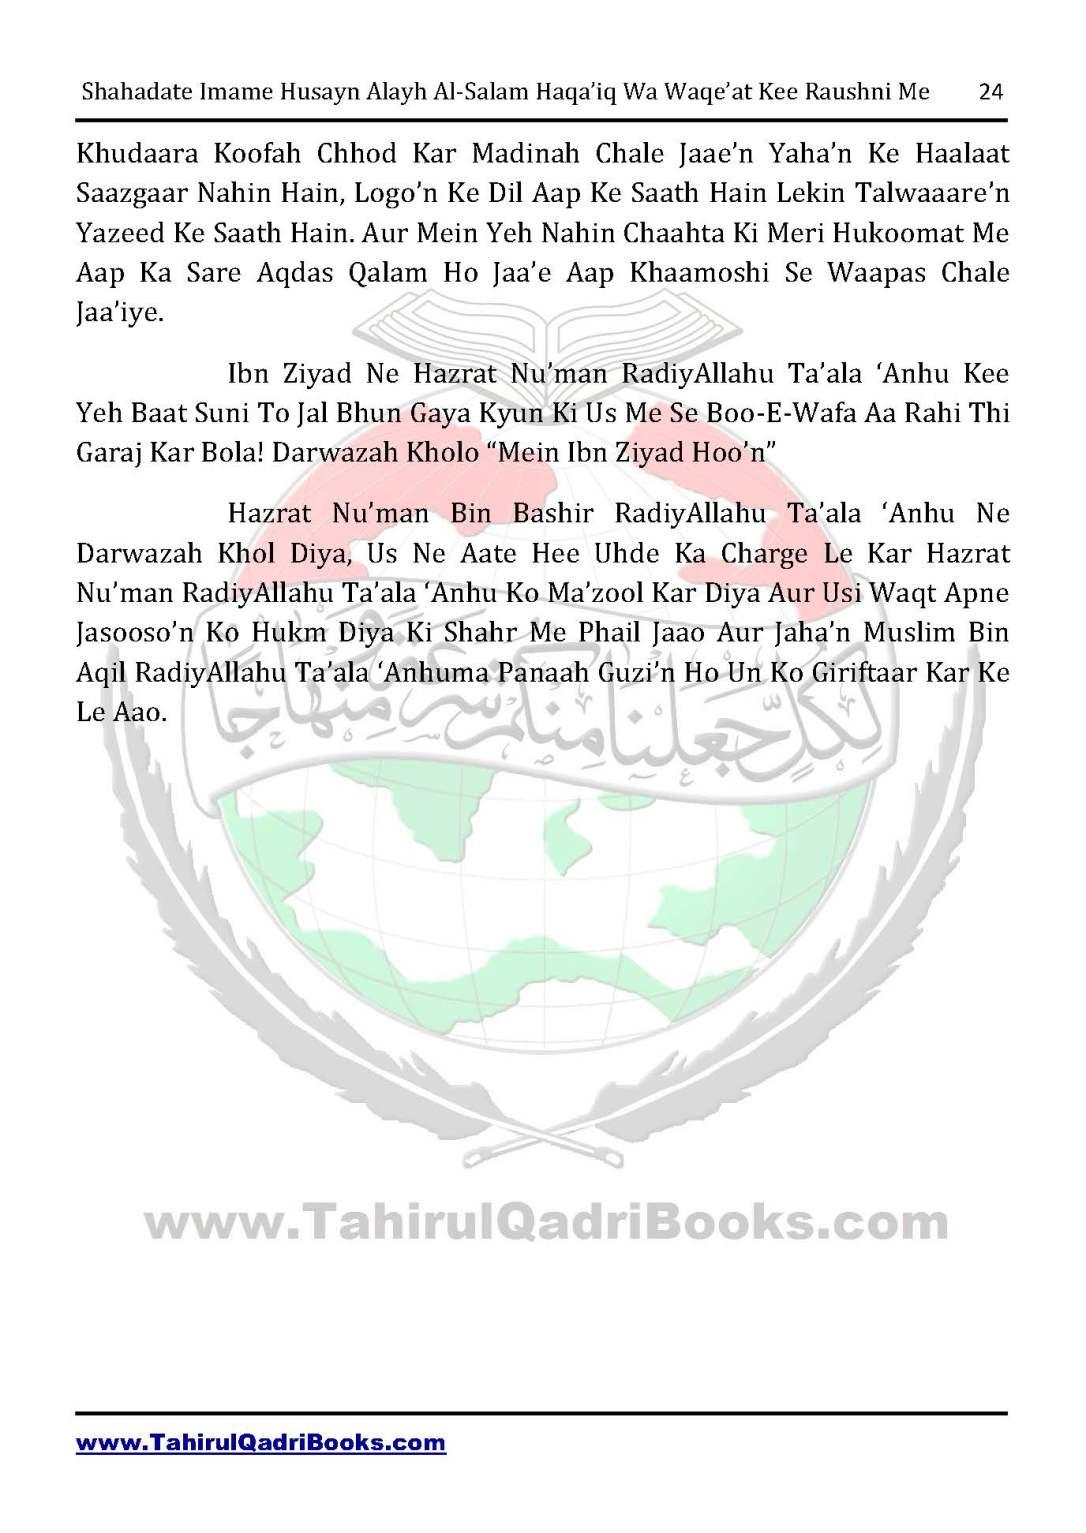 shahadate-imame-husayn-alayh-is-salam-haqaiq-wa-waqe_at-kee-raushni-me-in-roman-urdu-unlocked_Page_24